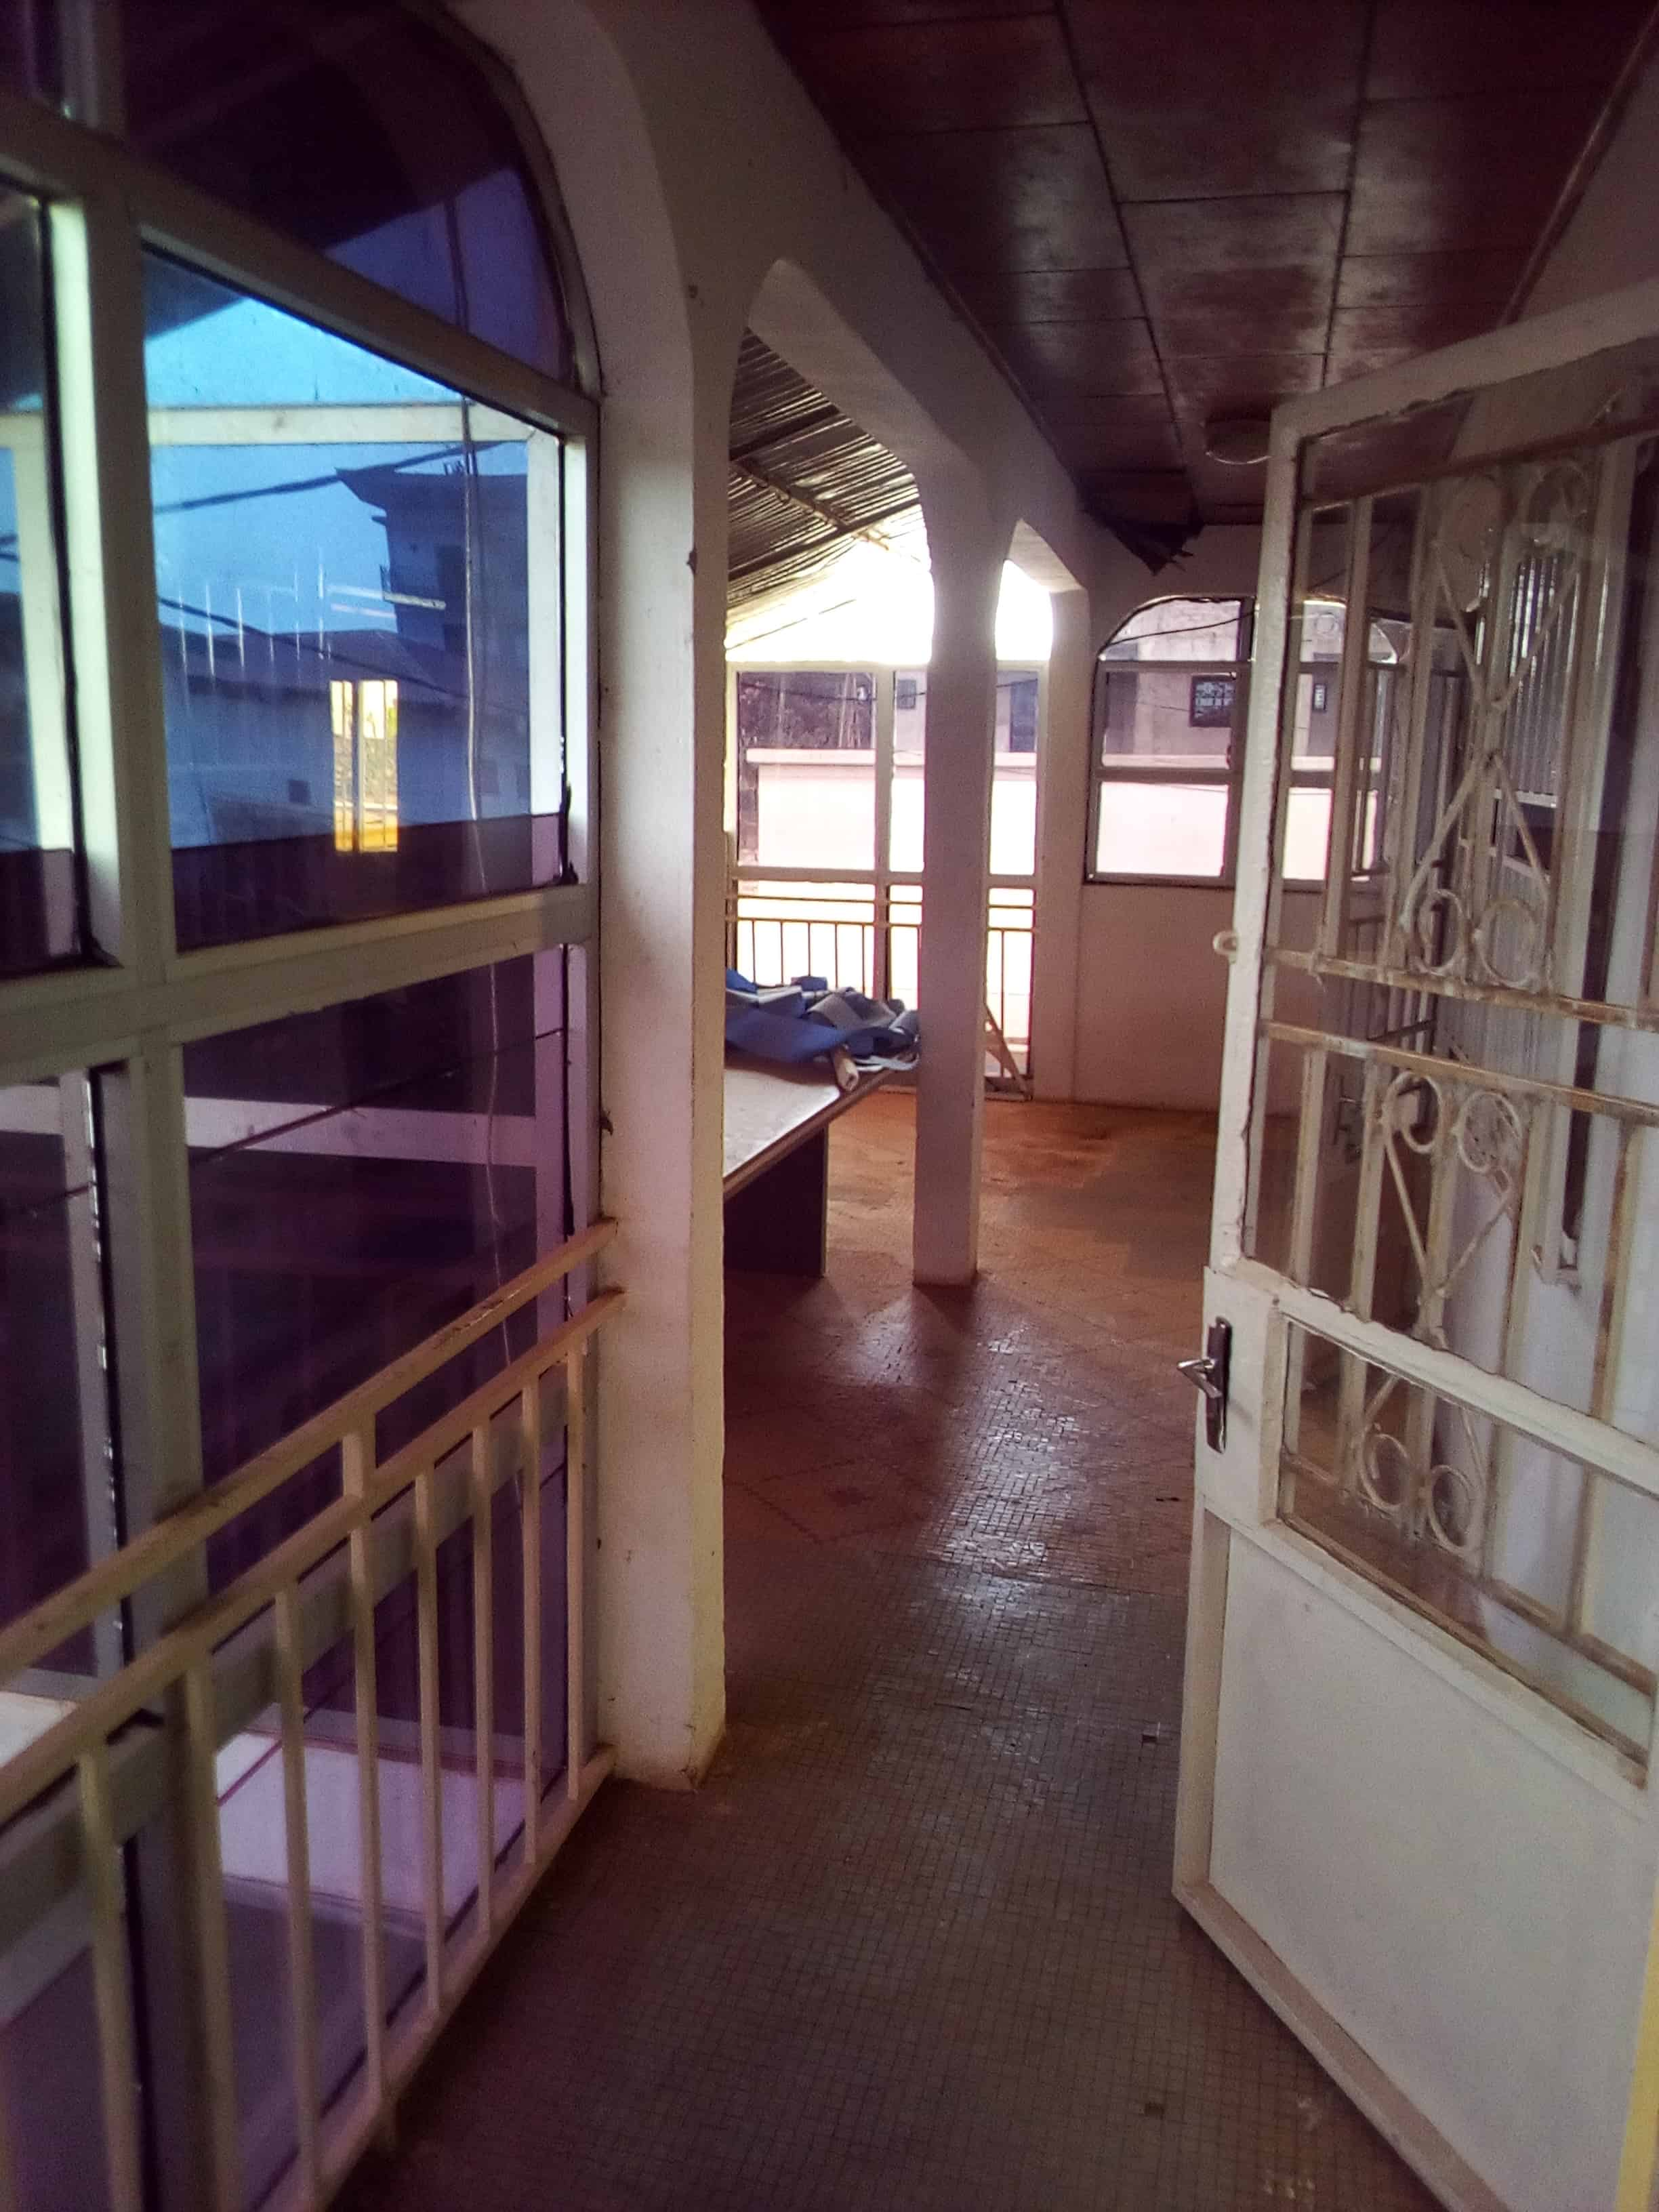 Bureau à louer à Yaoundé, Mfandena, OMNISPORT - 800 m2 - 600 000 FCFA